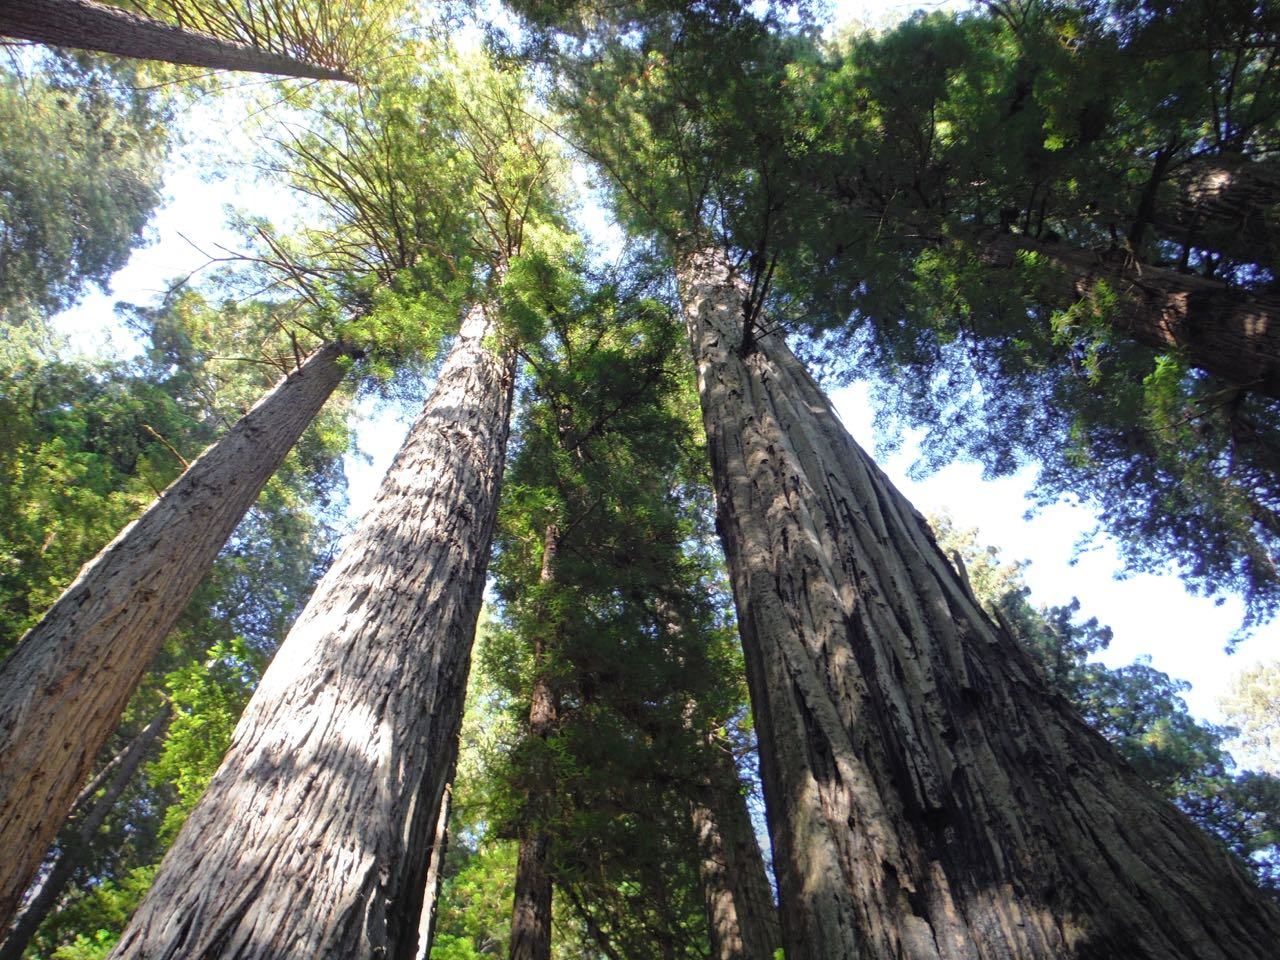 Redwoods 2017 10 01 231 Of 244